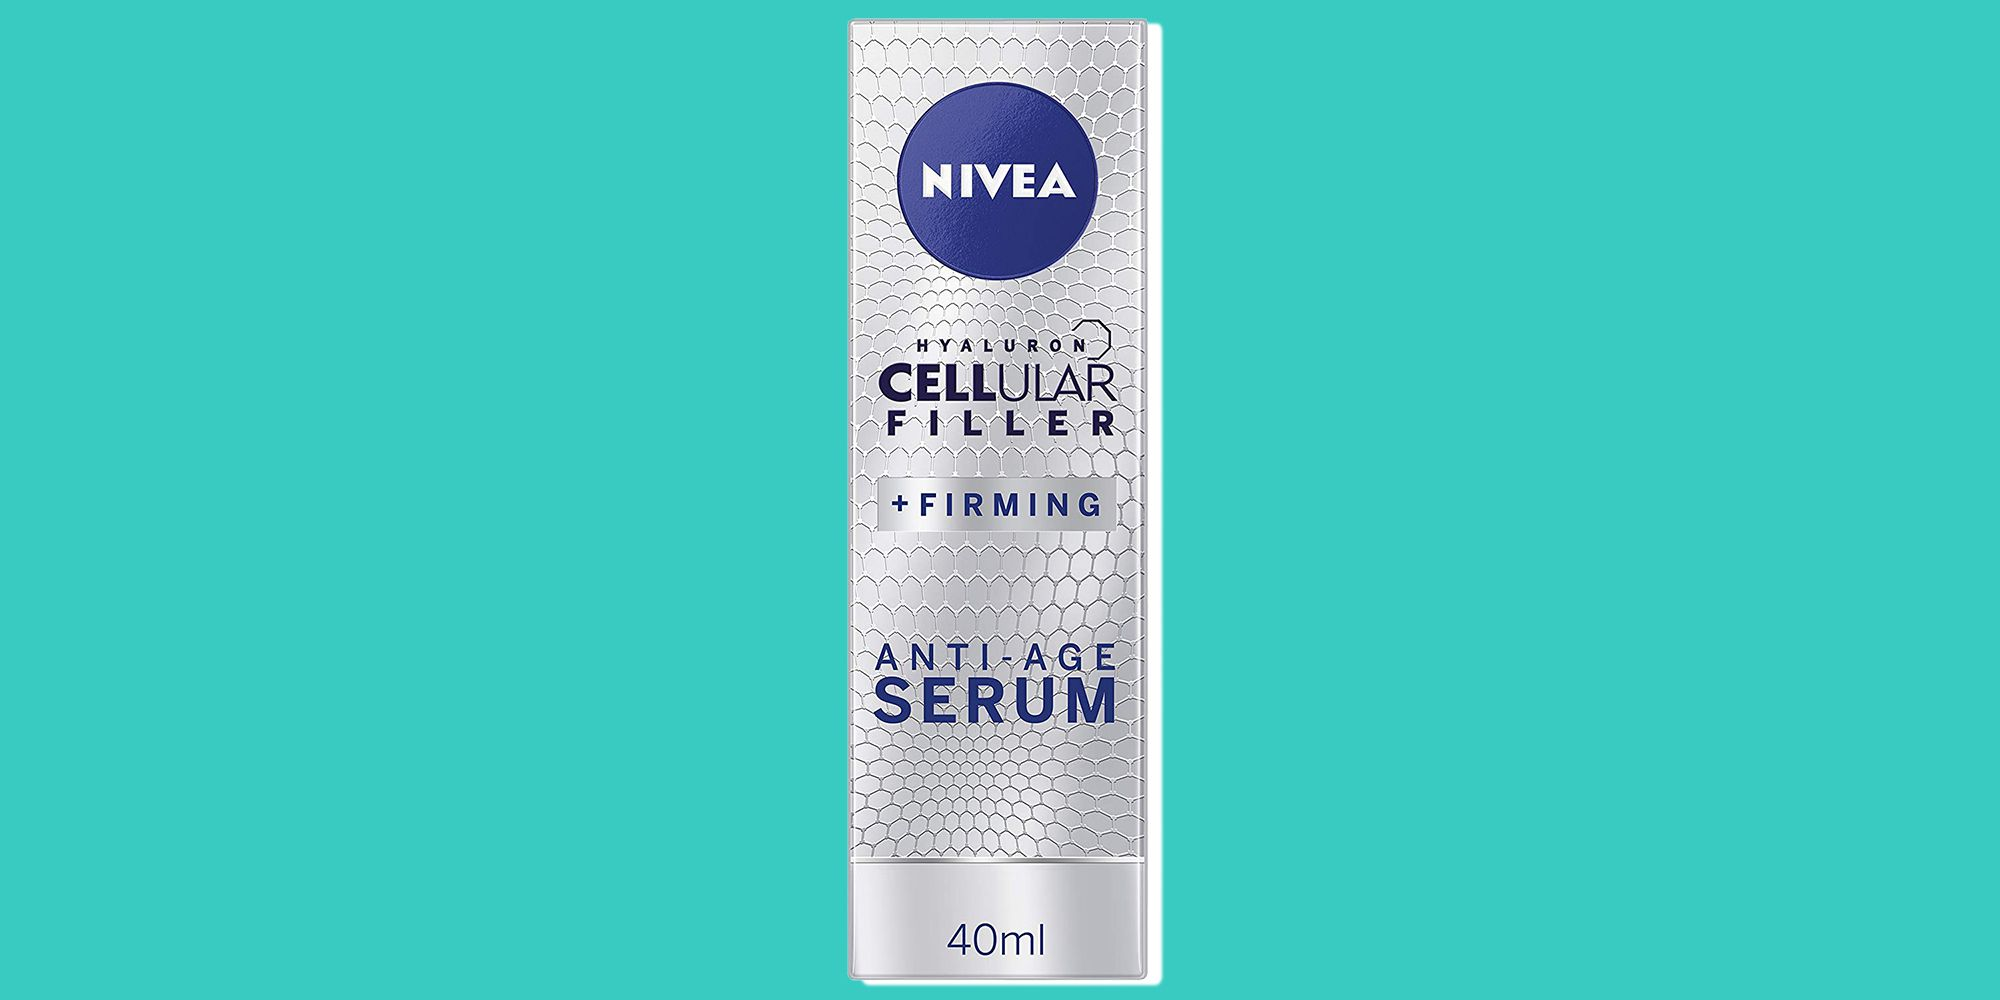 This top-performing hyaluronic acid serum is just £15.95